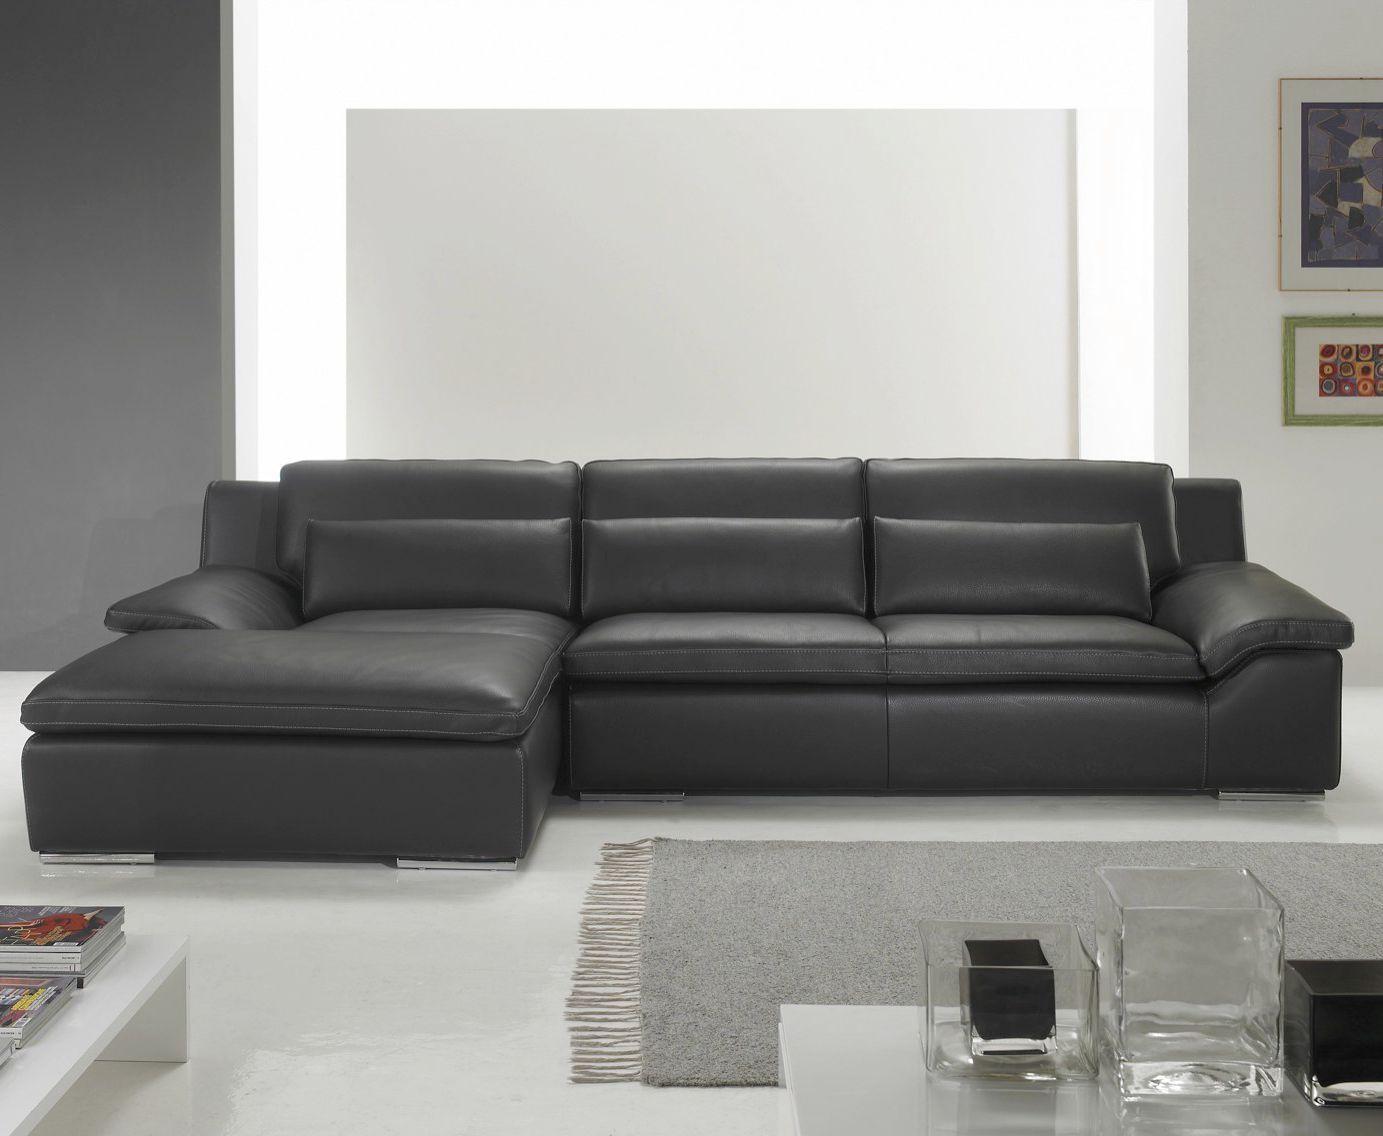 Modular Sofa Glamour Very